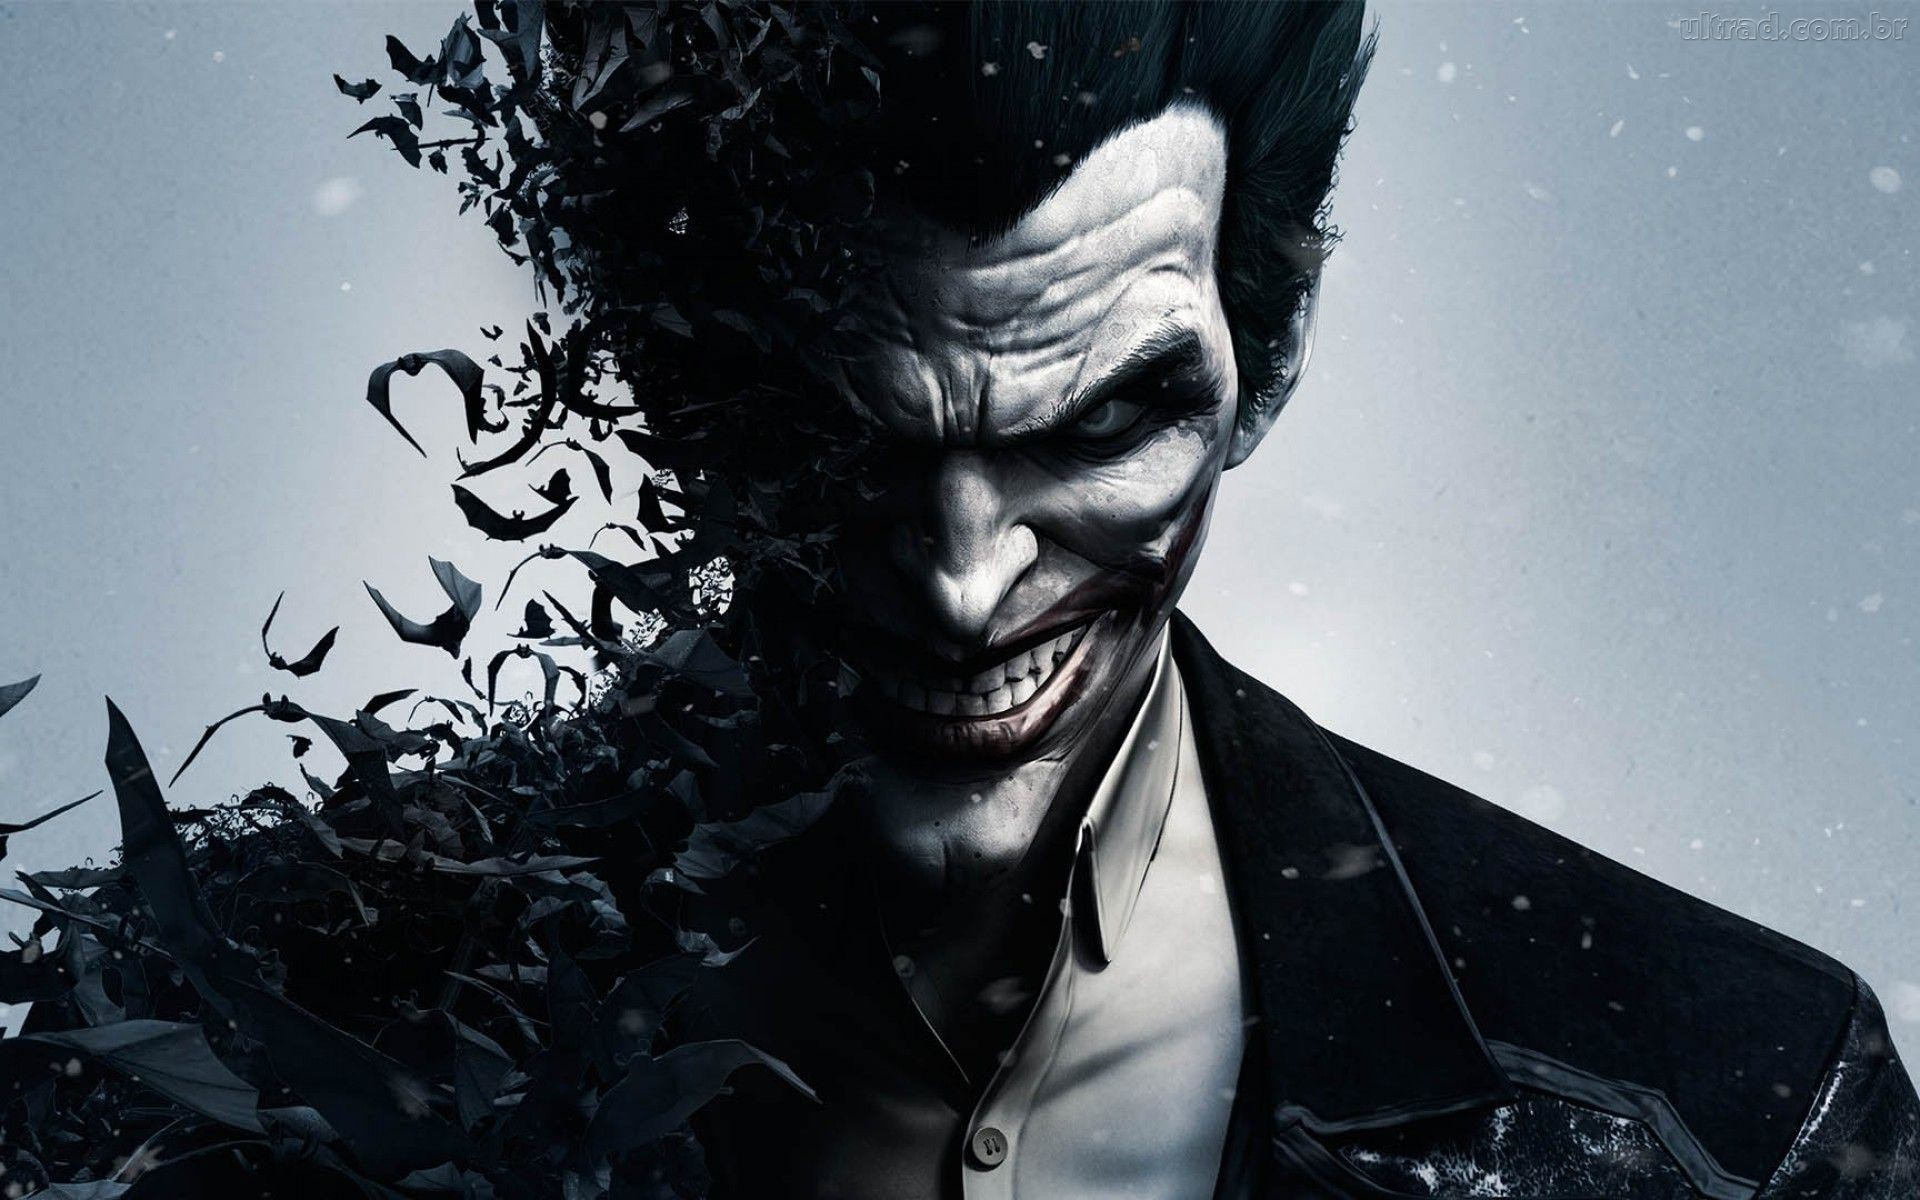 Wallpapers For > The Joker Wallpaper Hd Iphone